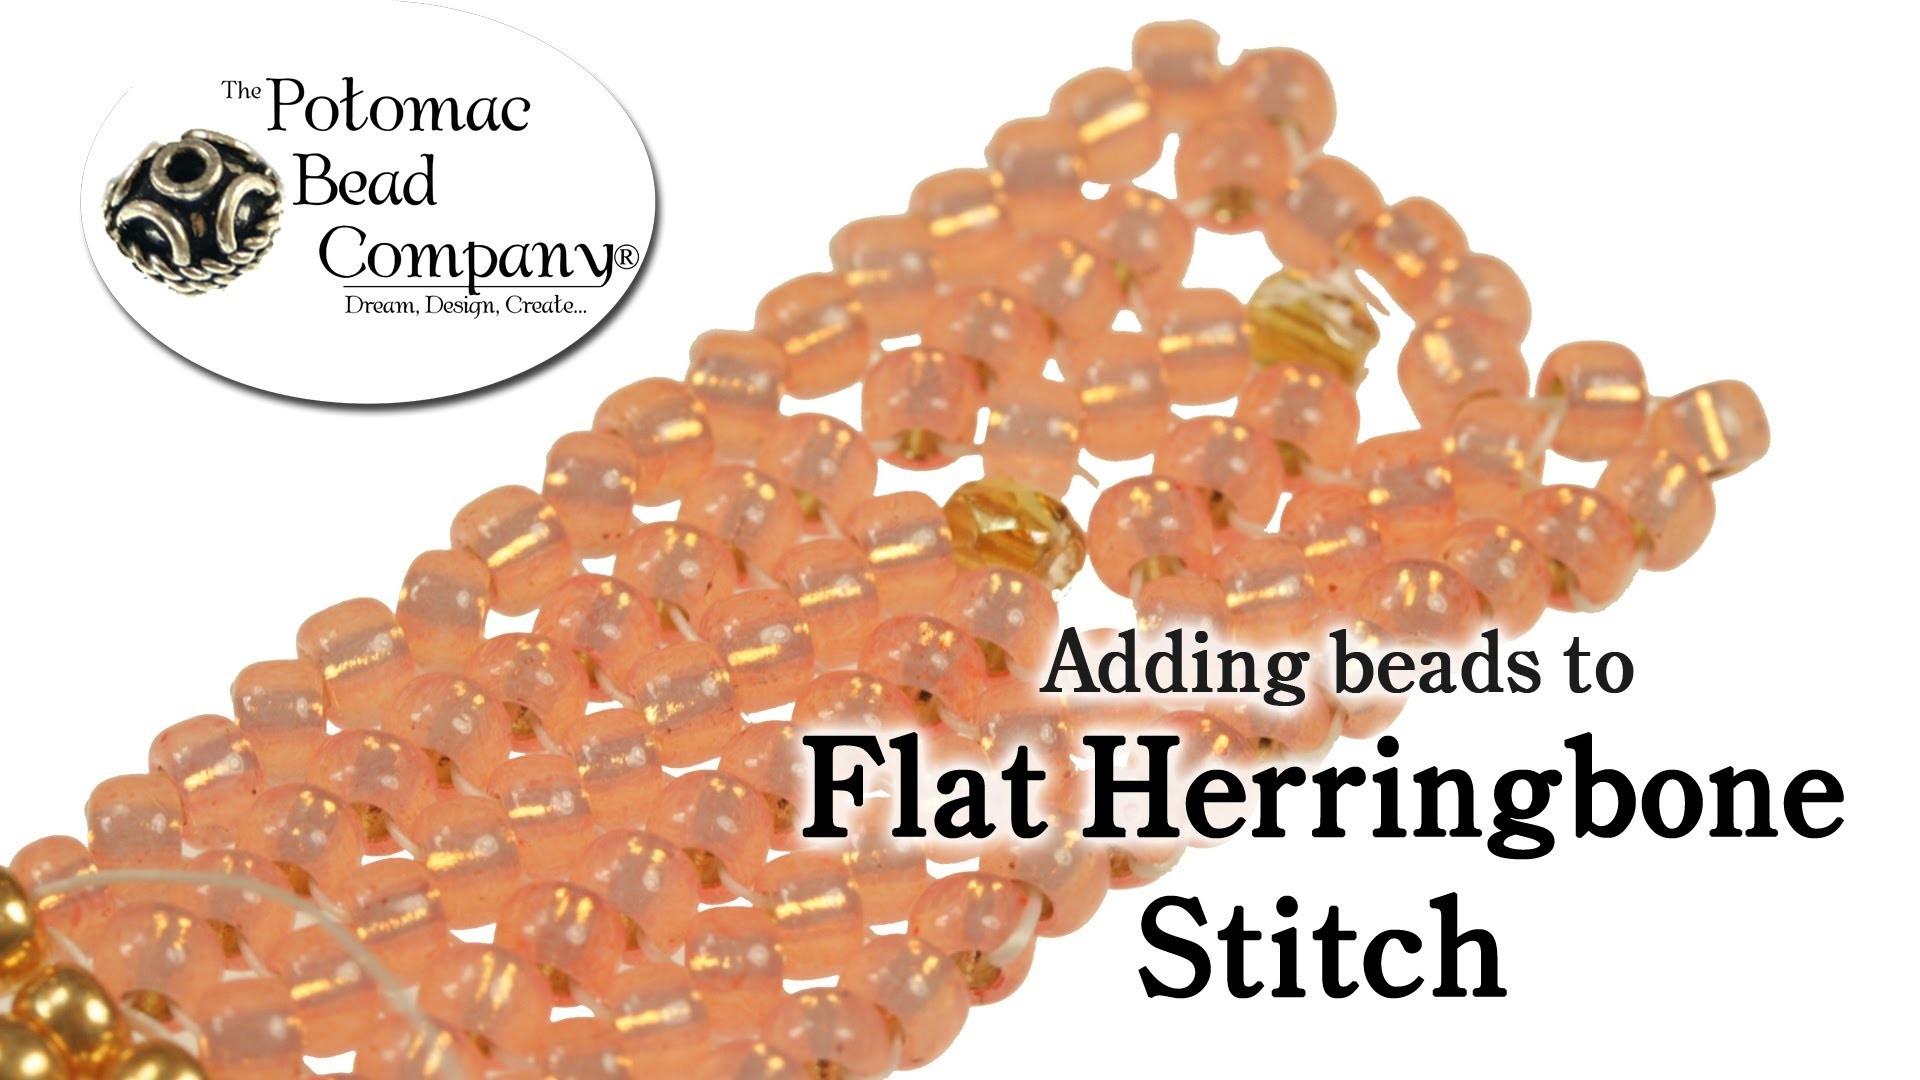 Adding Beads to Flat Herringbone Stitch